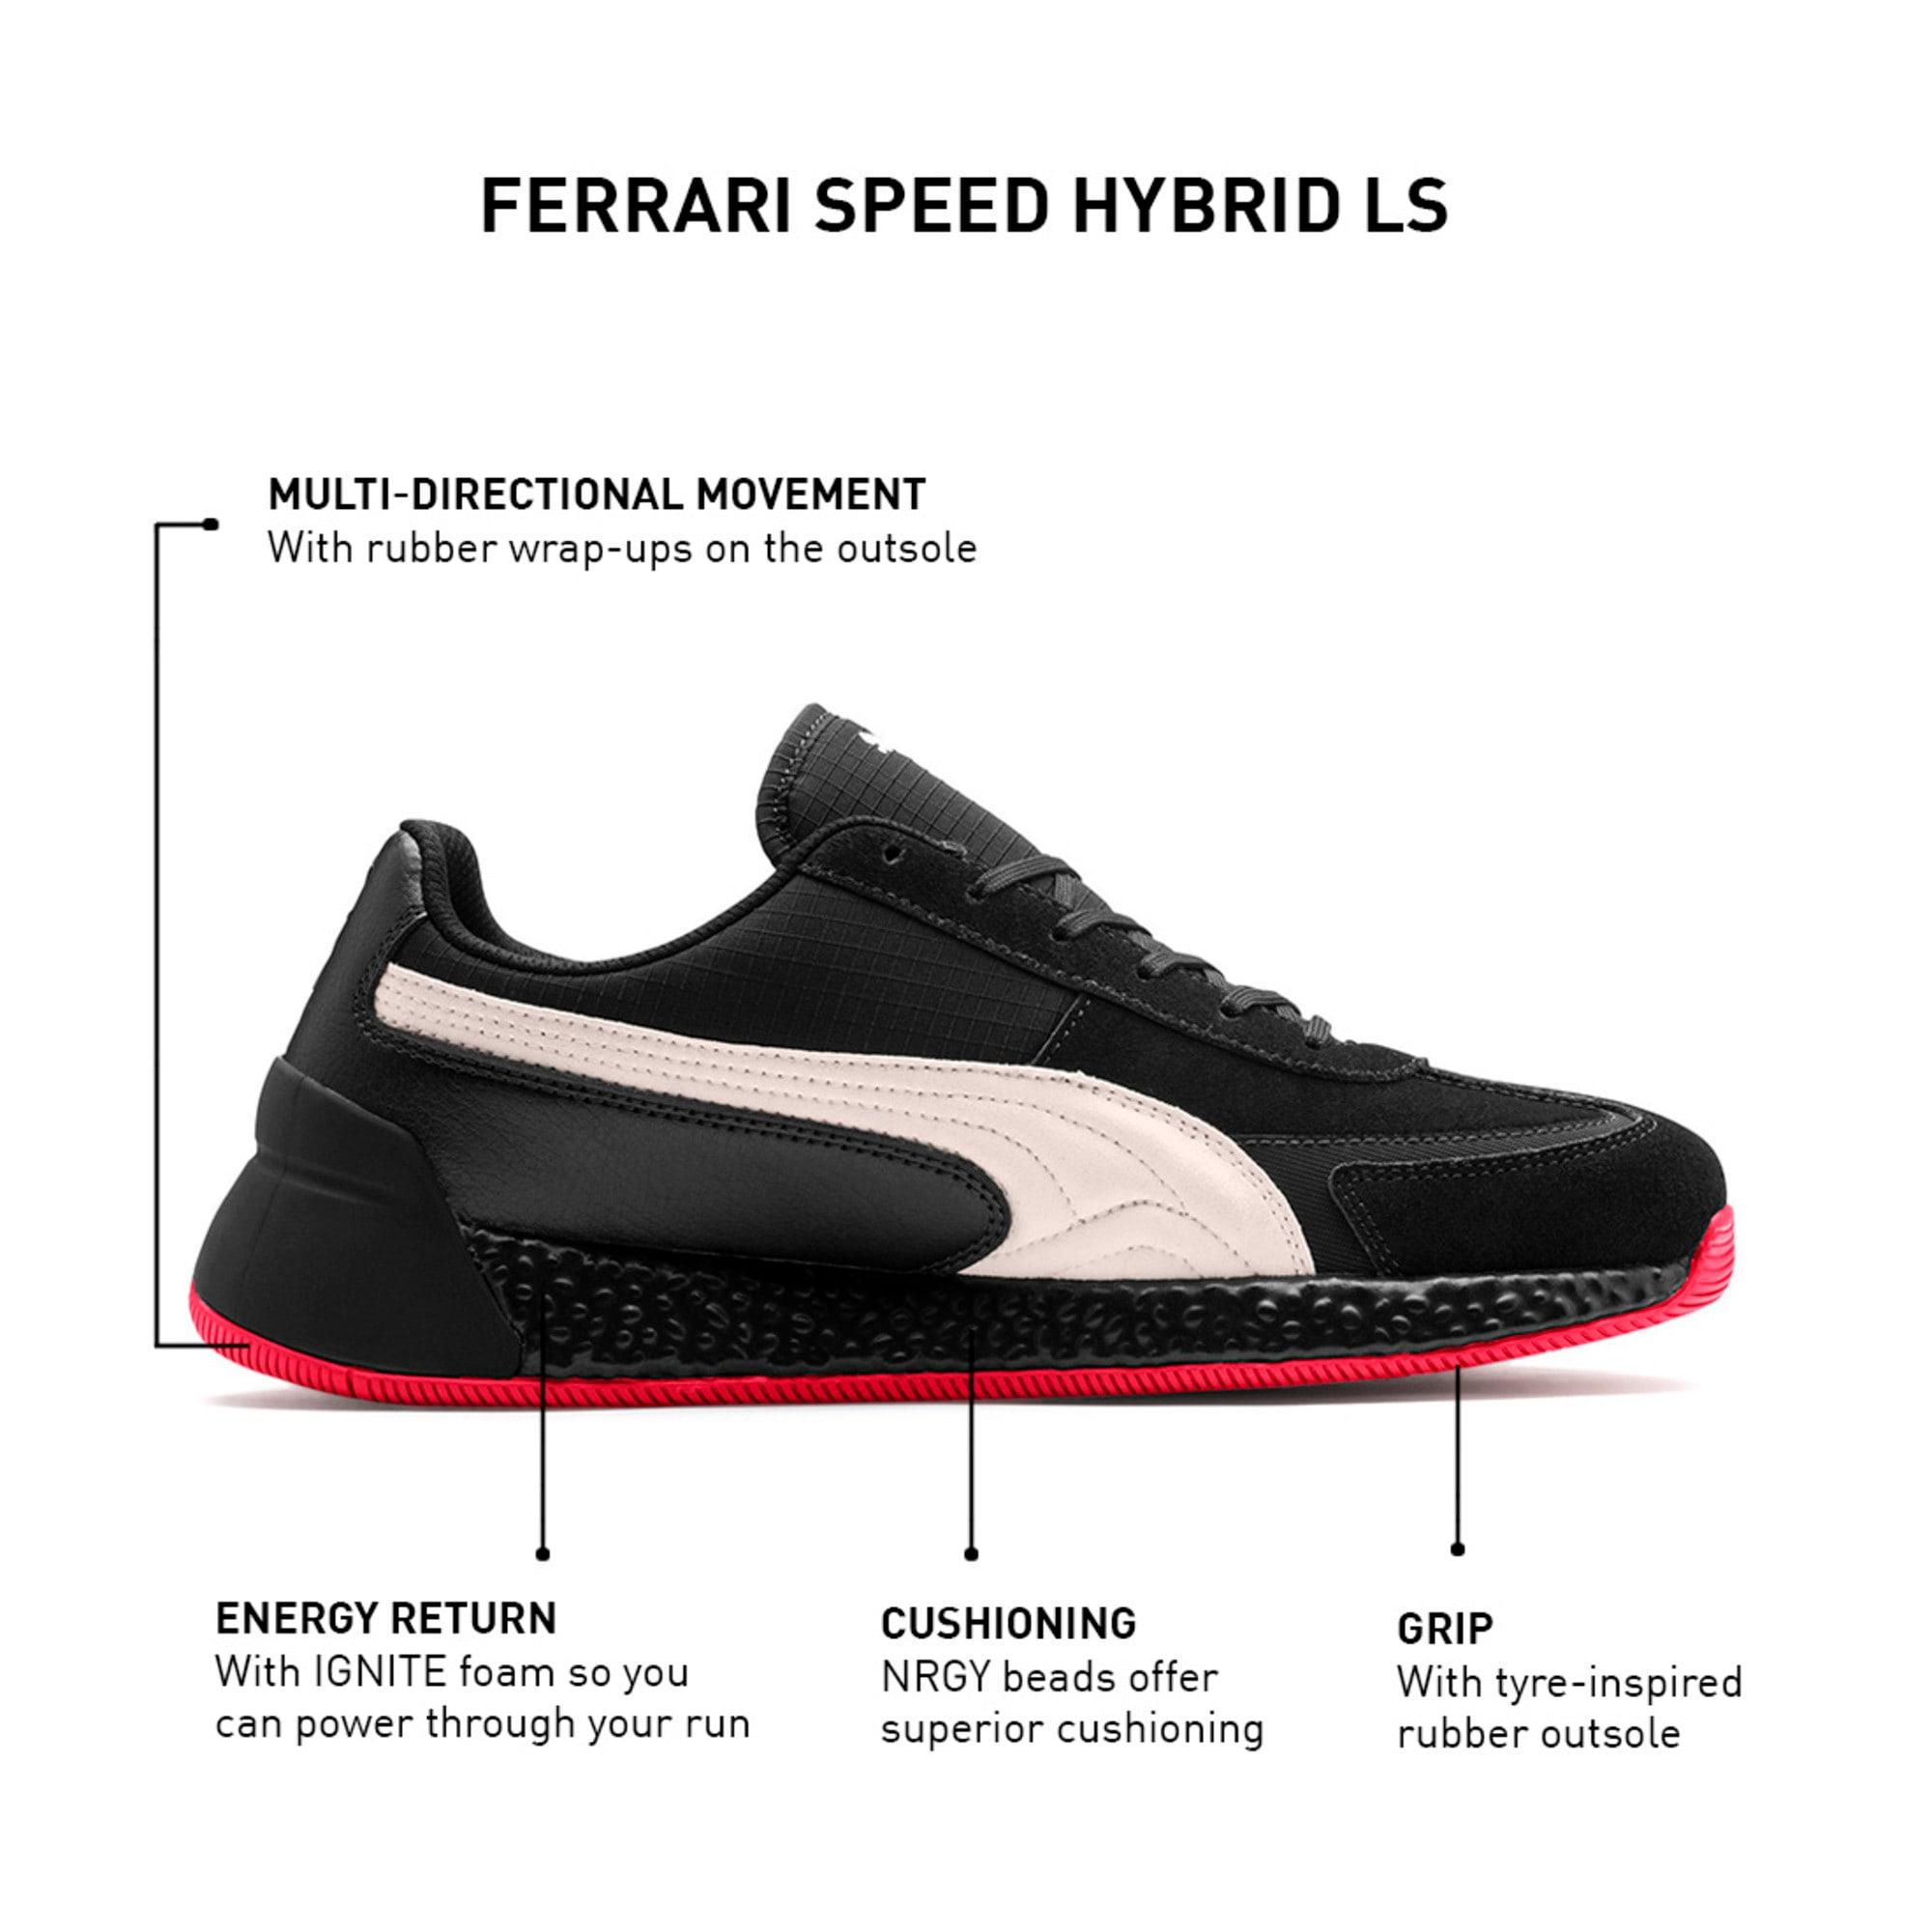 Thumbnail 9 of Ferrari Speed HYBRID LS Men's Trainers, Blk-Pstl Prchmnt-Rosso Corsa, medium-IND